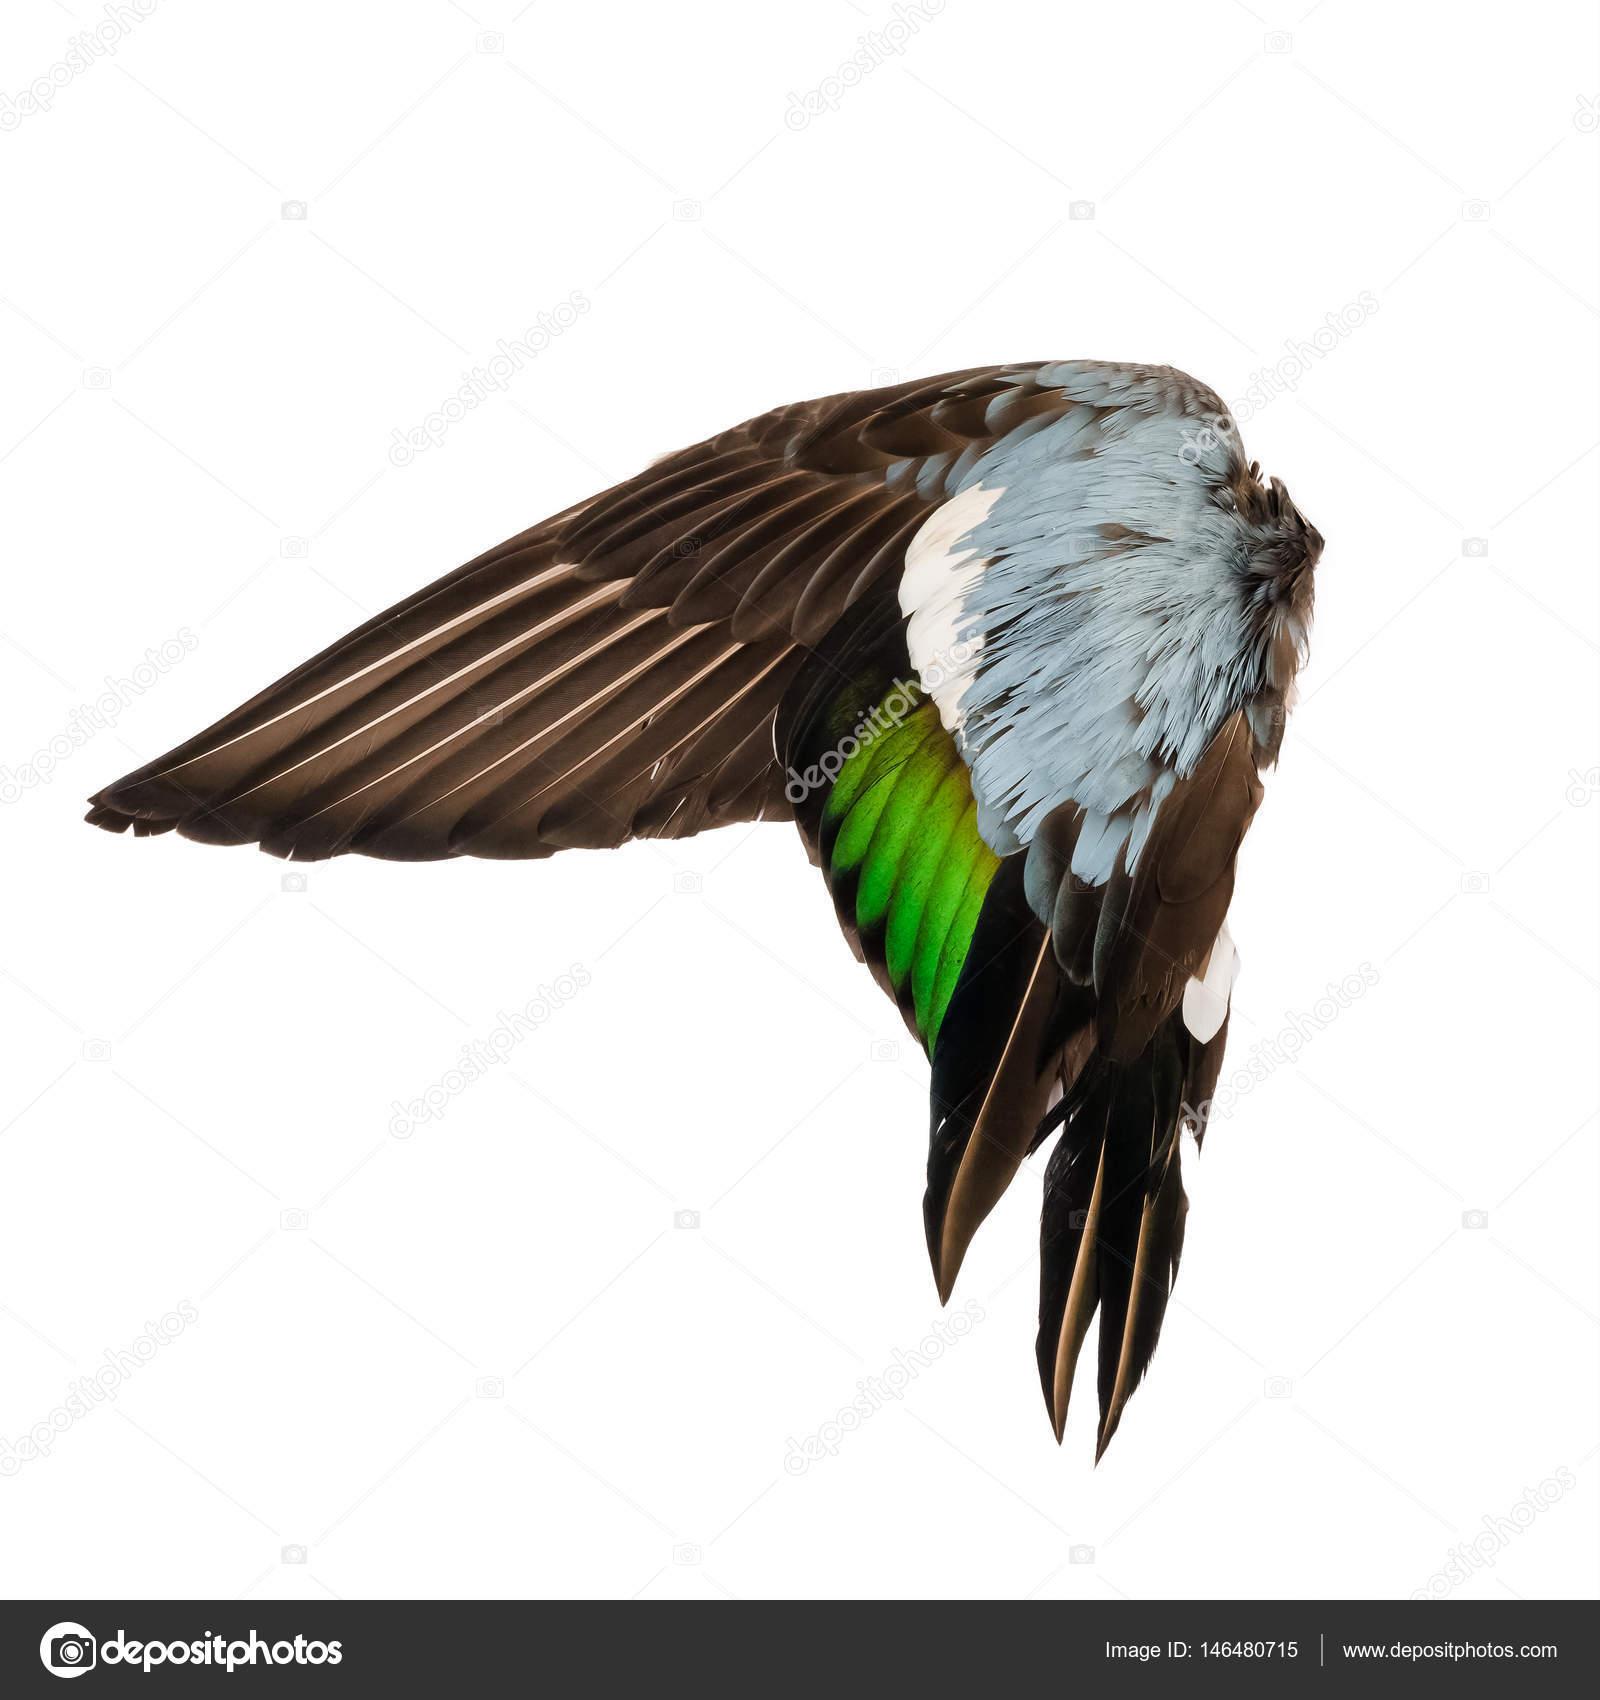 Pato real silvestre aves ala angel marrón gris verde azul fondo ...